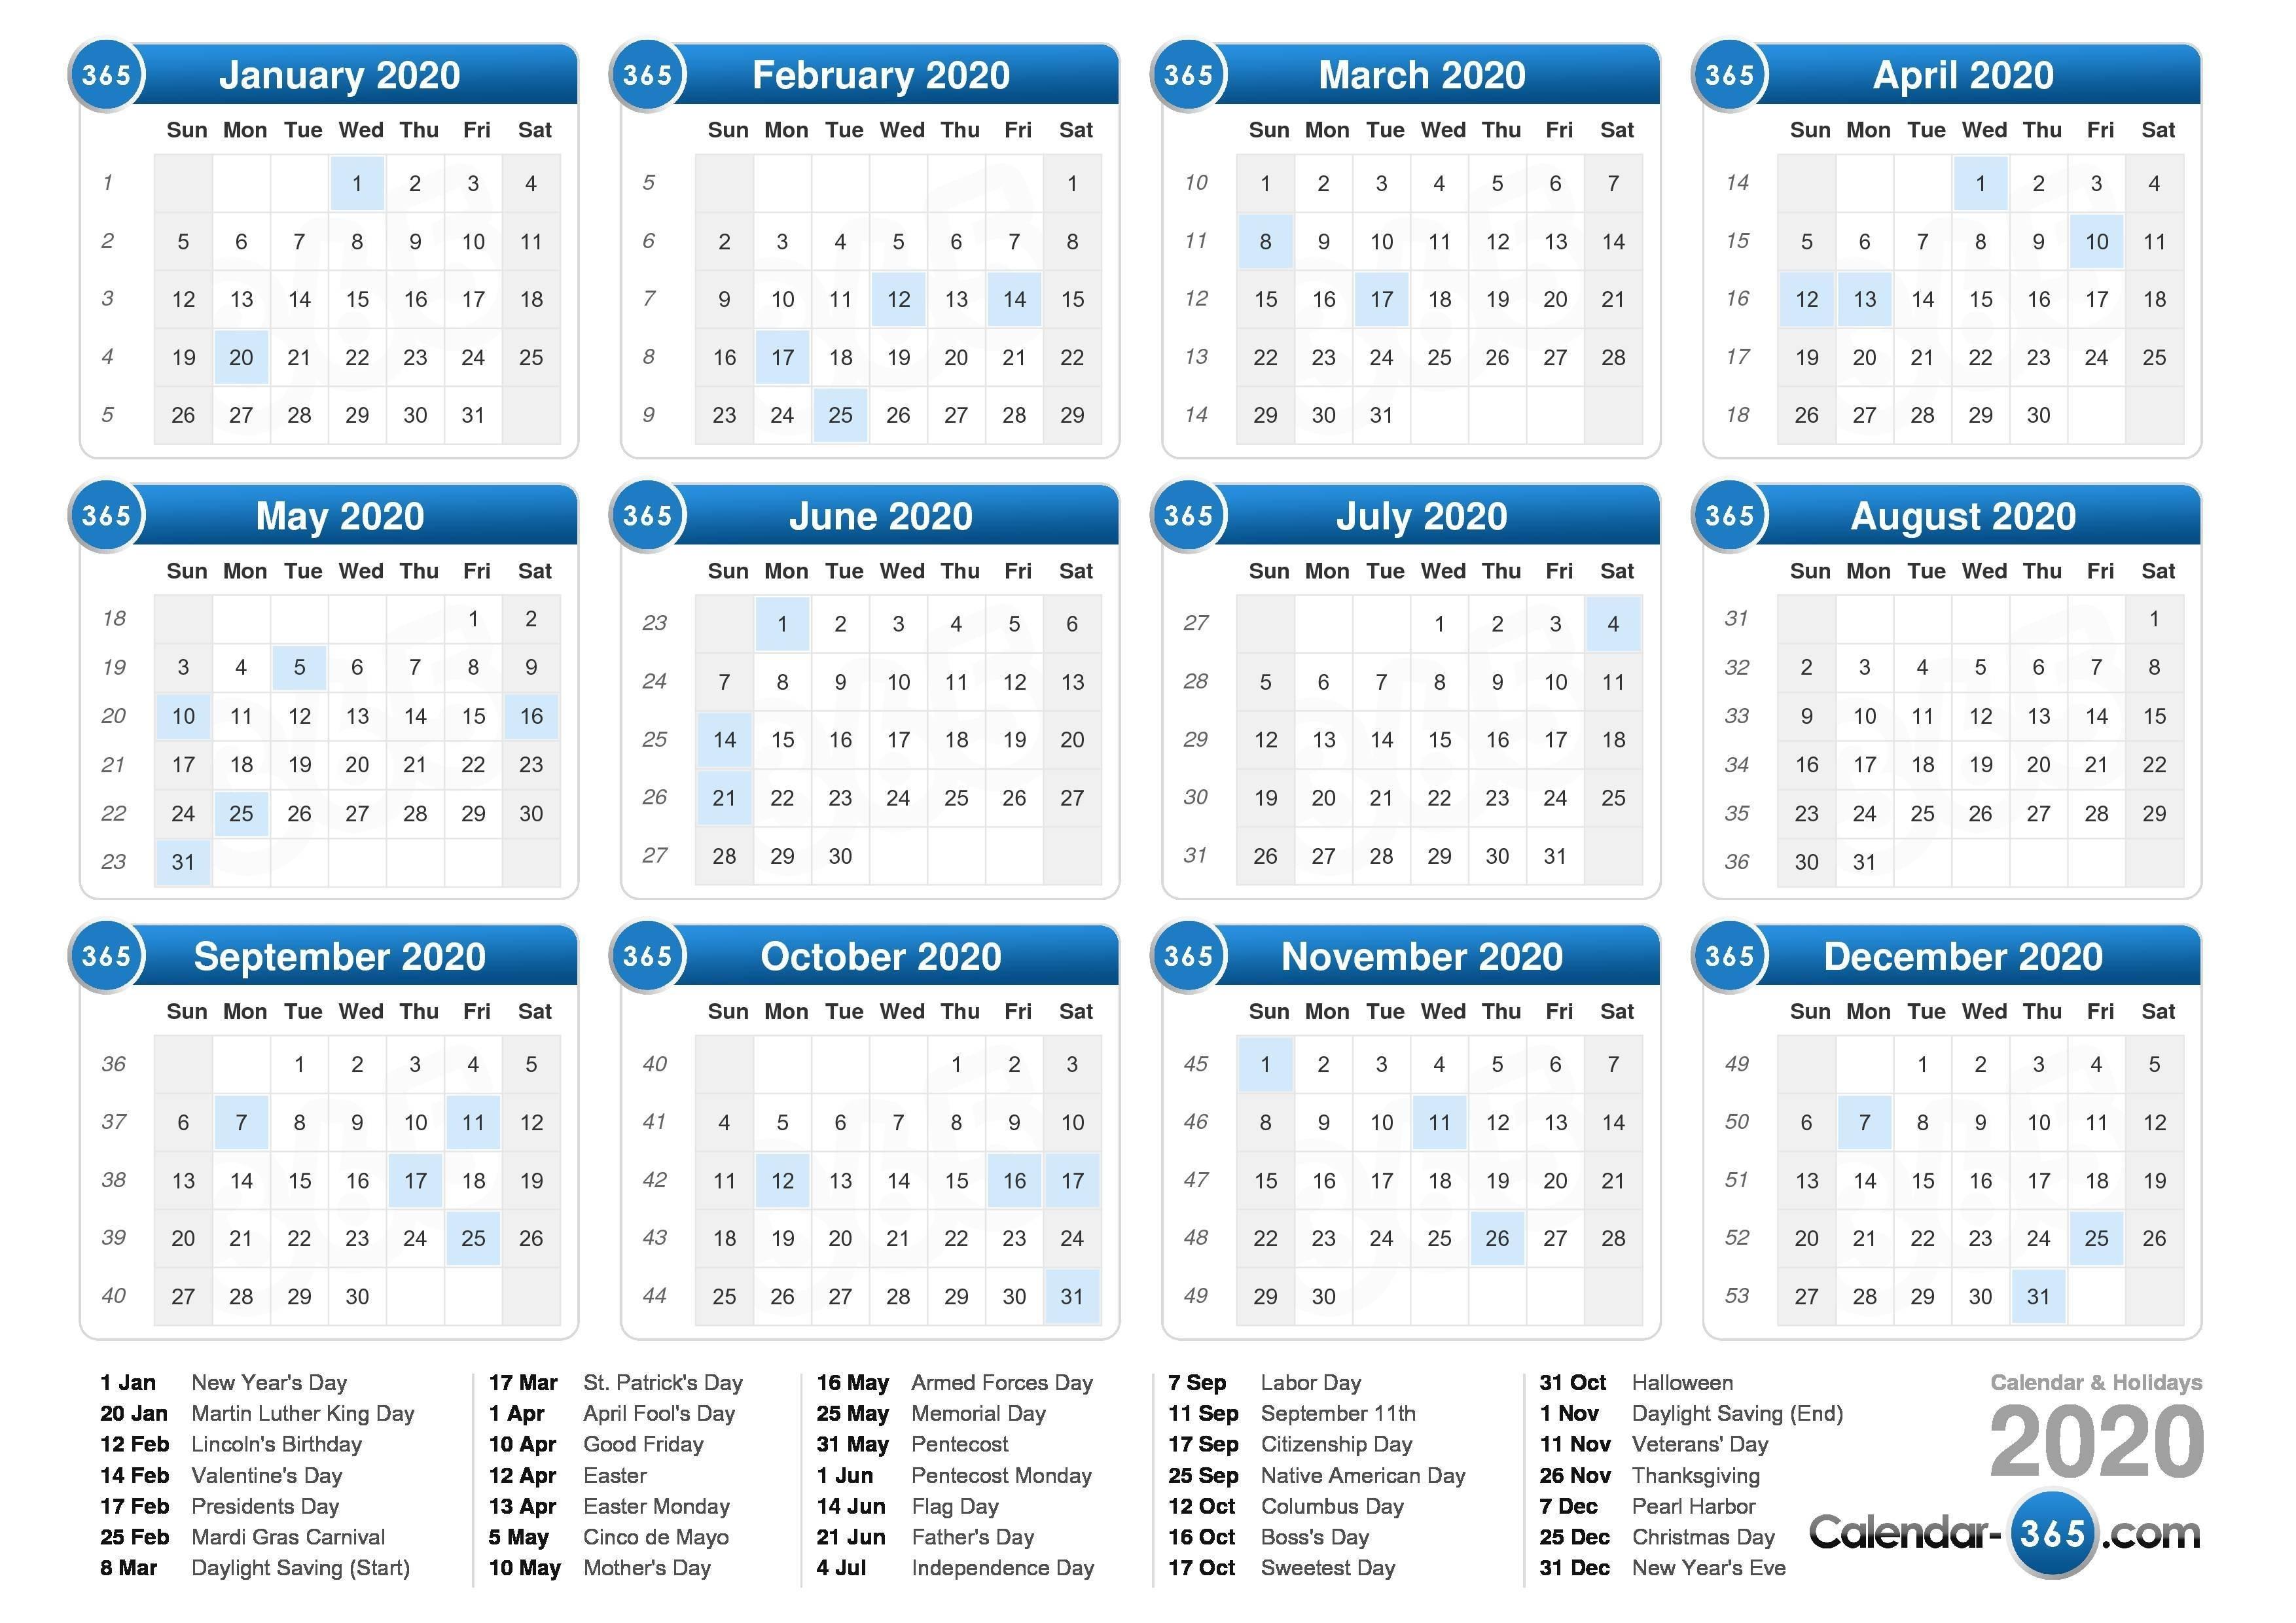 2020 Calendar-South Africa Public Holidays 2020